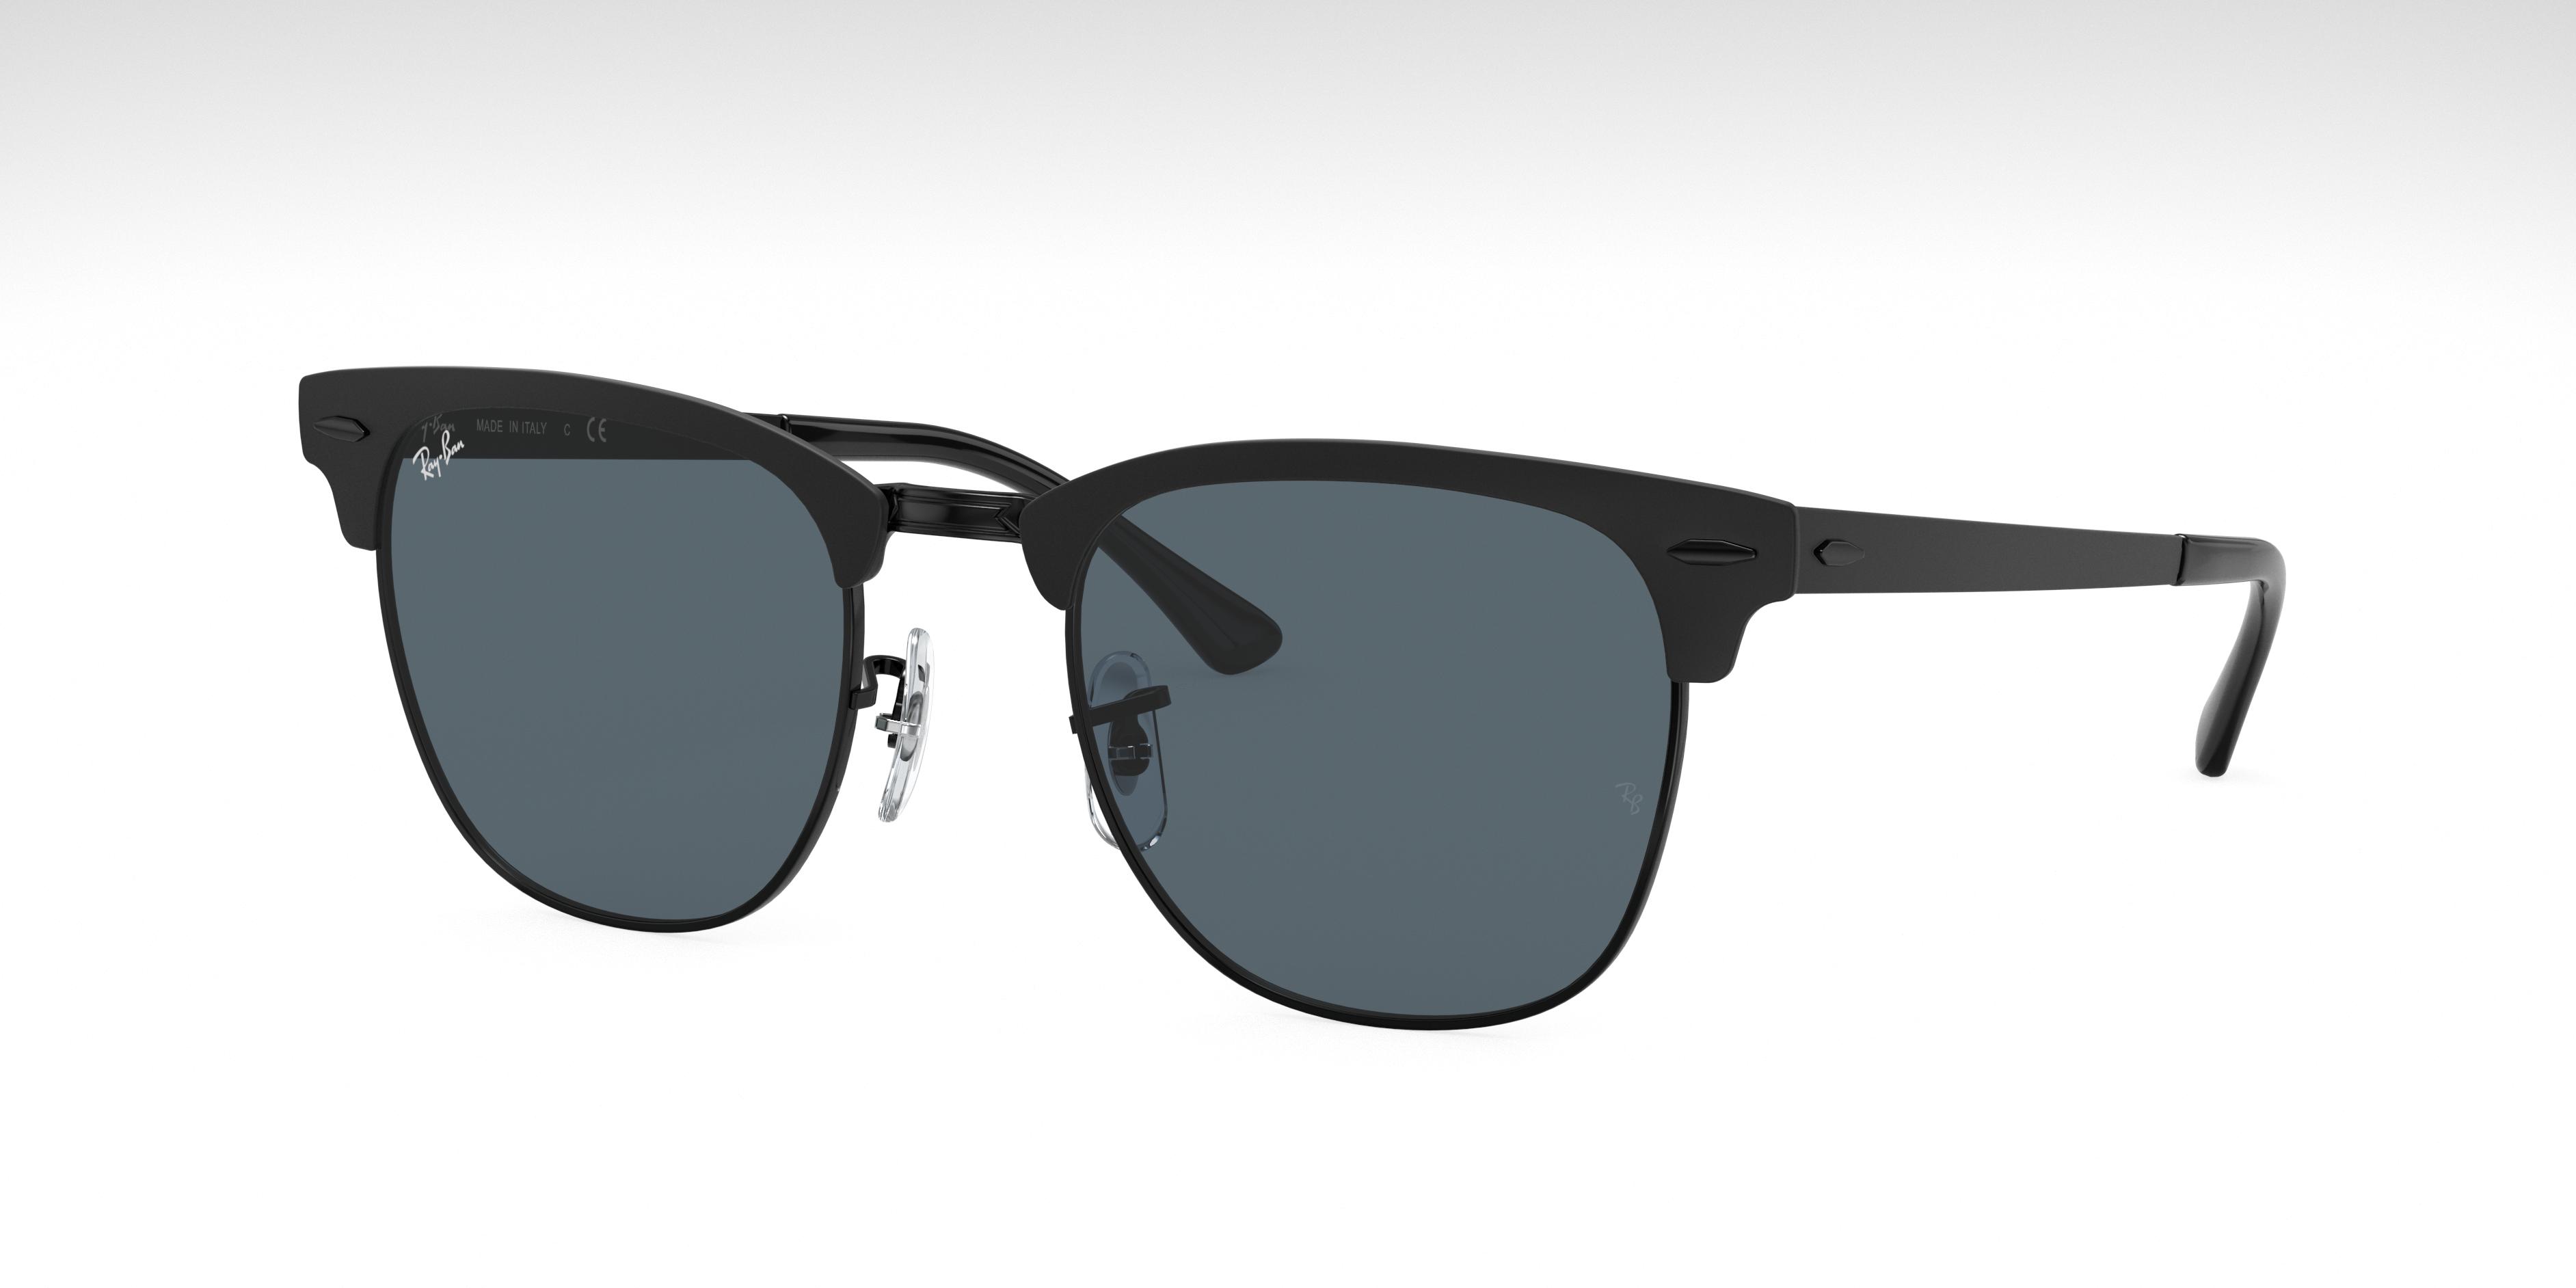 Ray-Ban Clubmaster Metal Black, Blue Lenses - RB3716